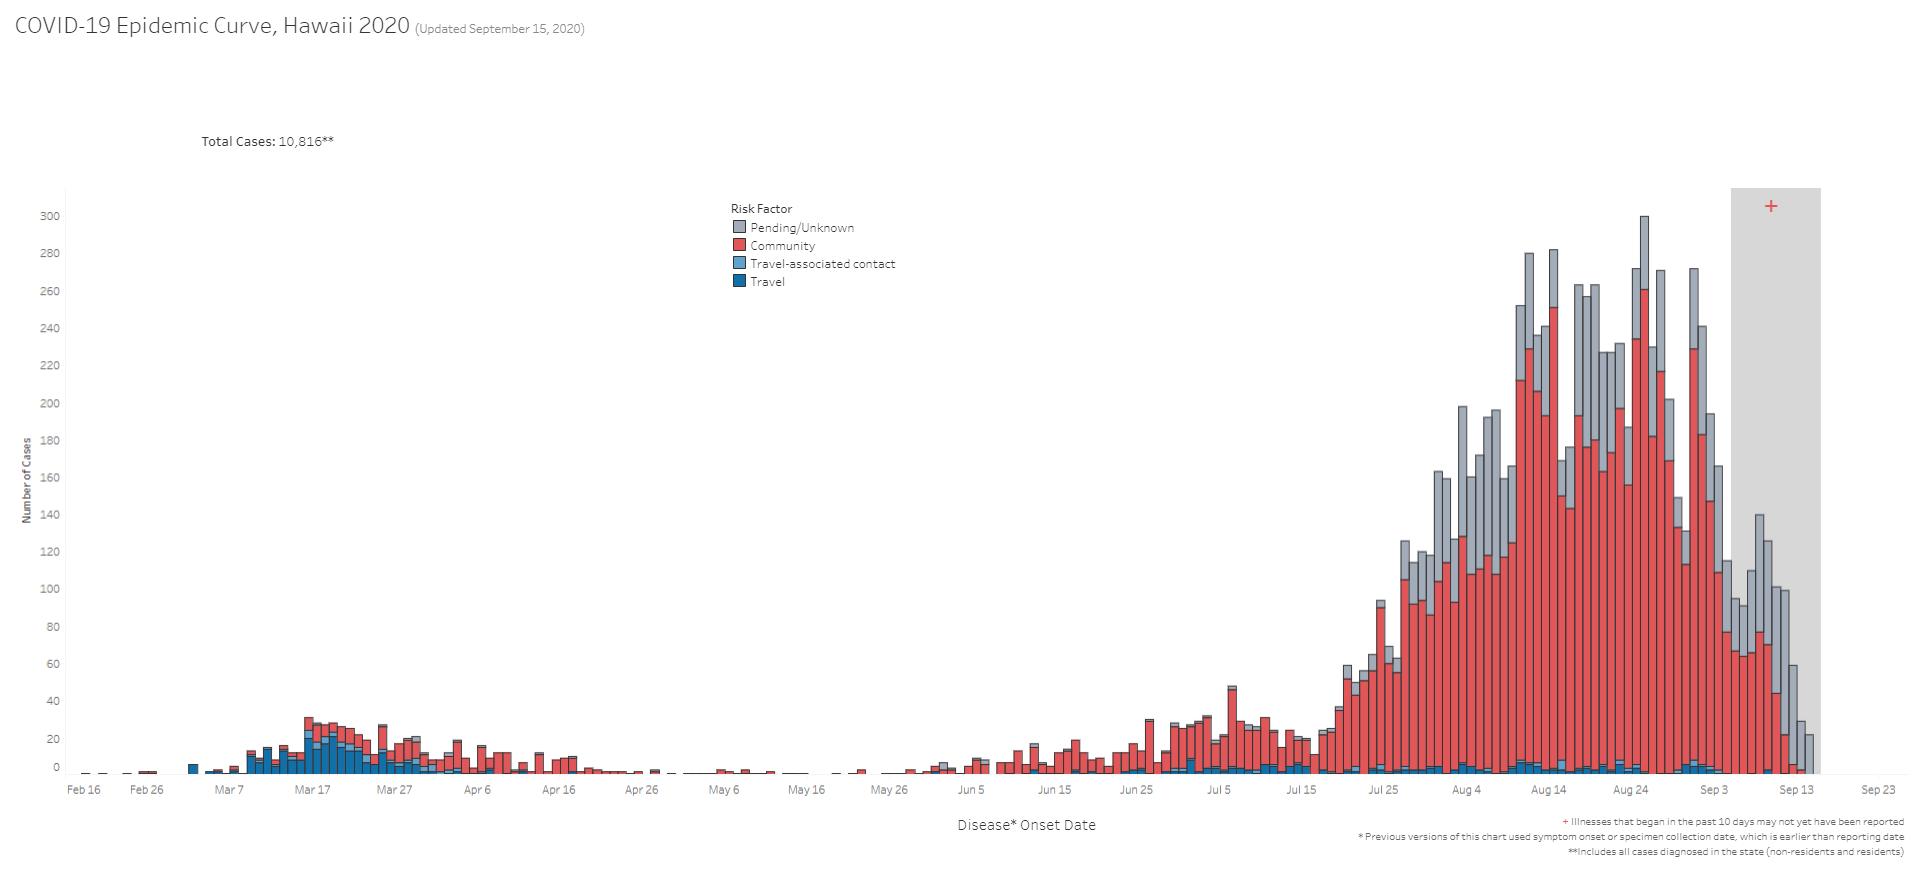 COVID-19 Epidemic Curve Hawaii September 15, 2020